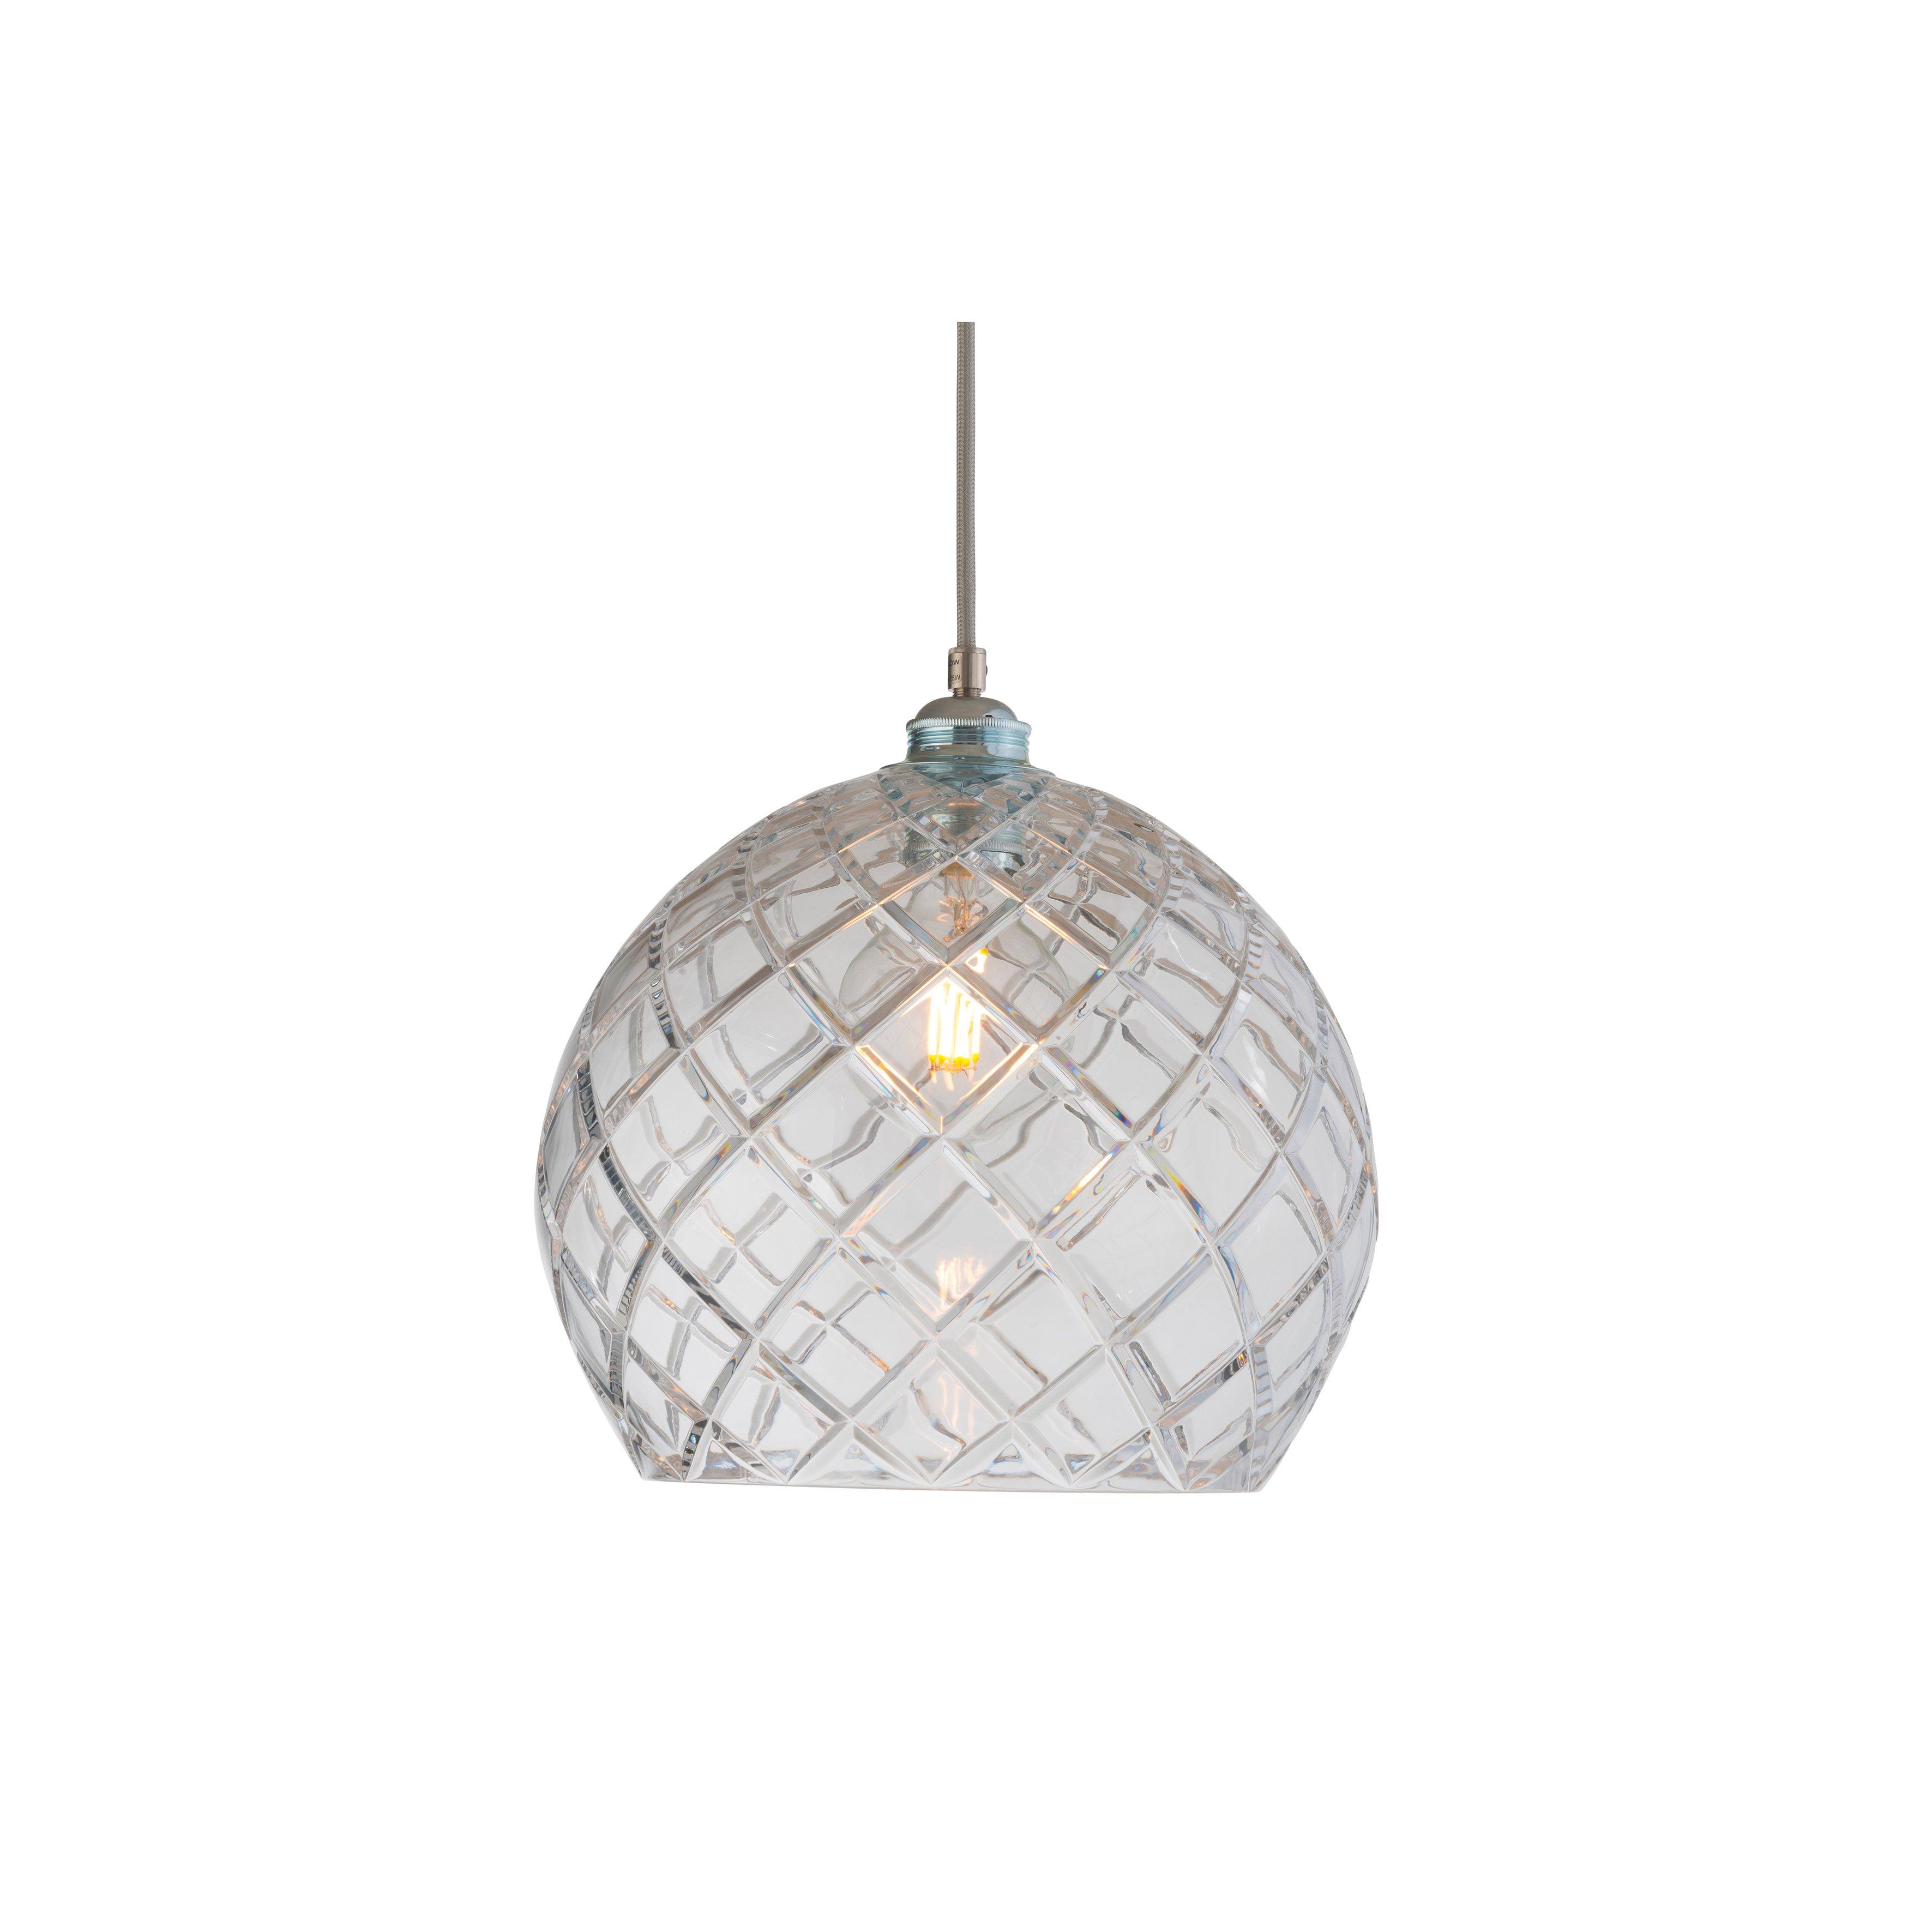 image-Rowan Crystal Pendant Lamp , 28cm, Silver , Large Check